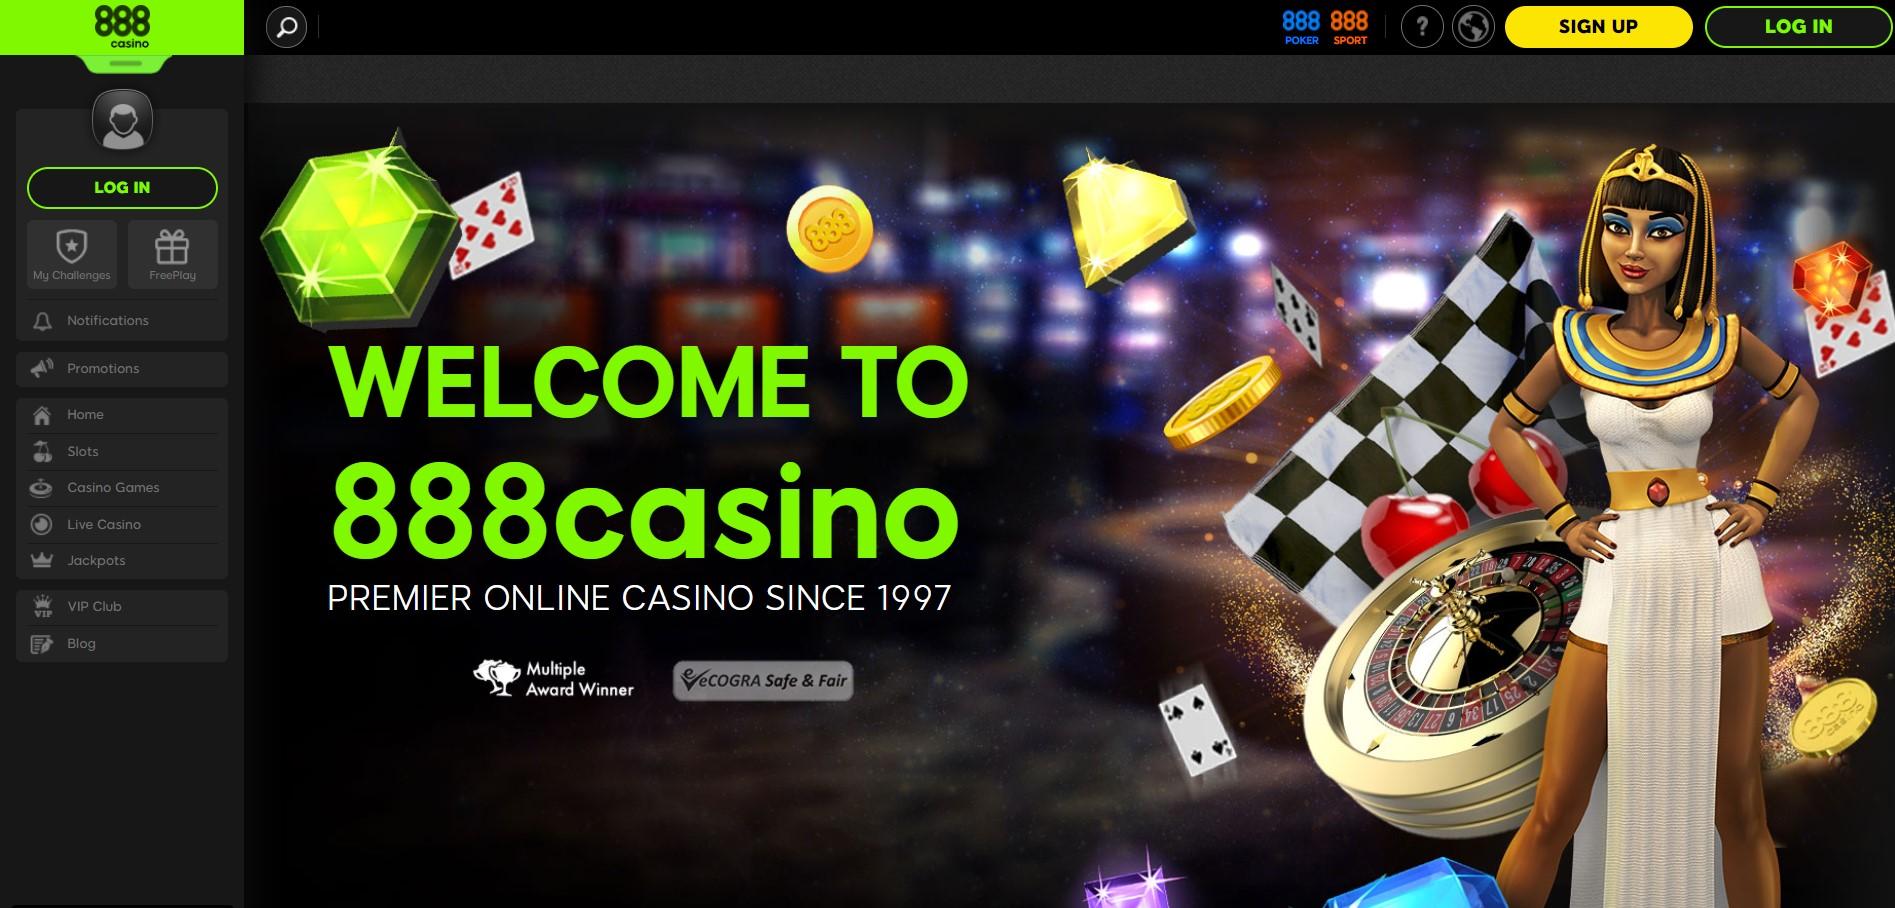 Casino 888 welcome